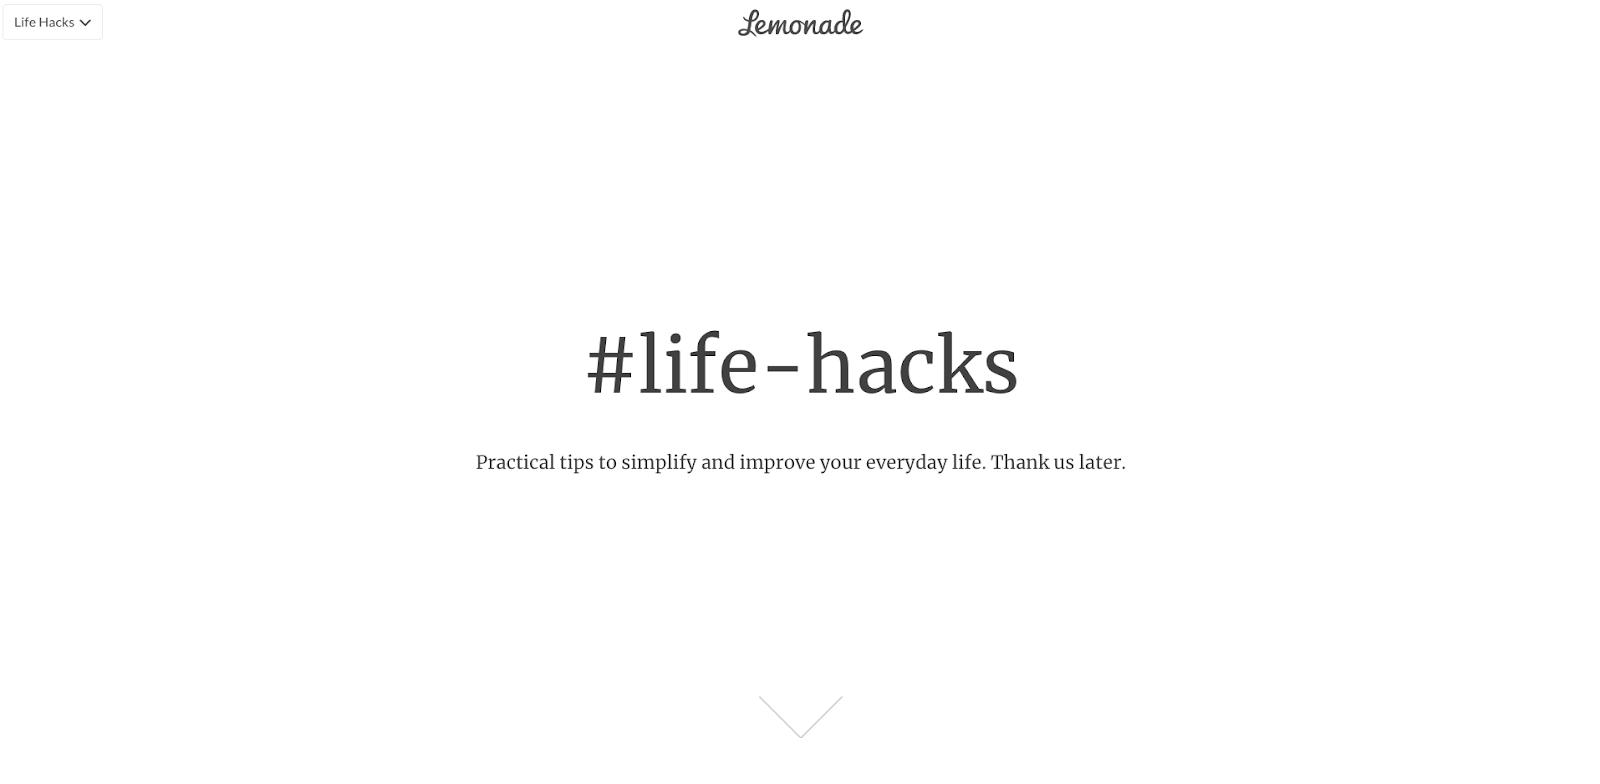 Lemonade life-hacks